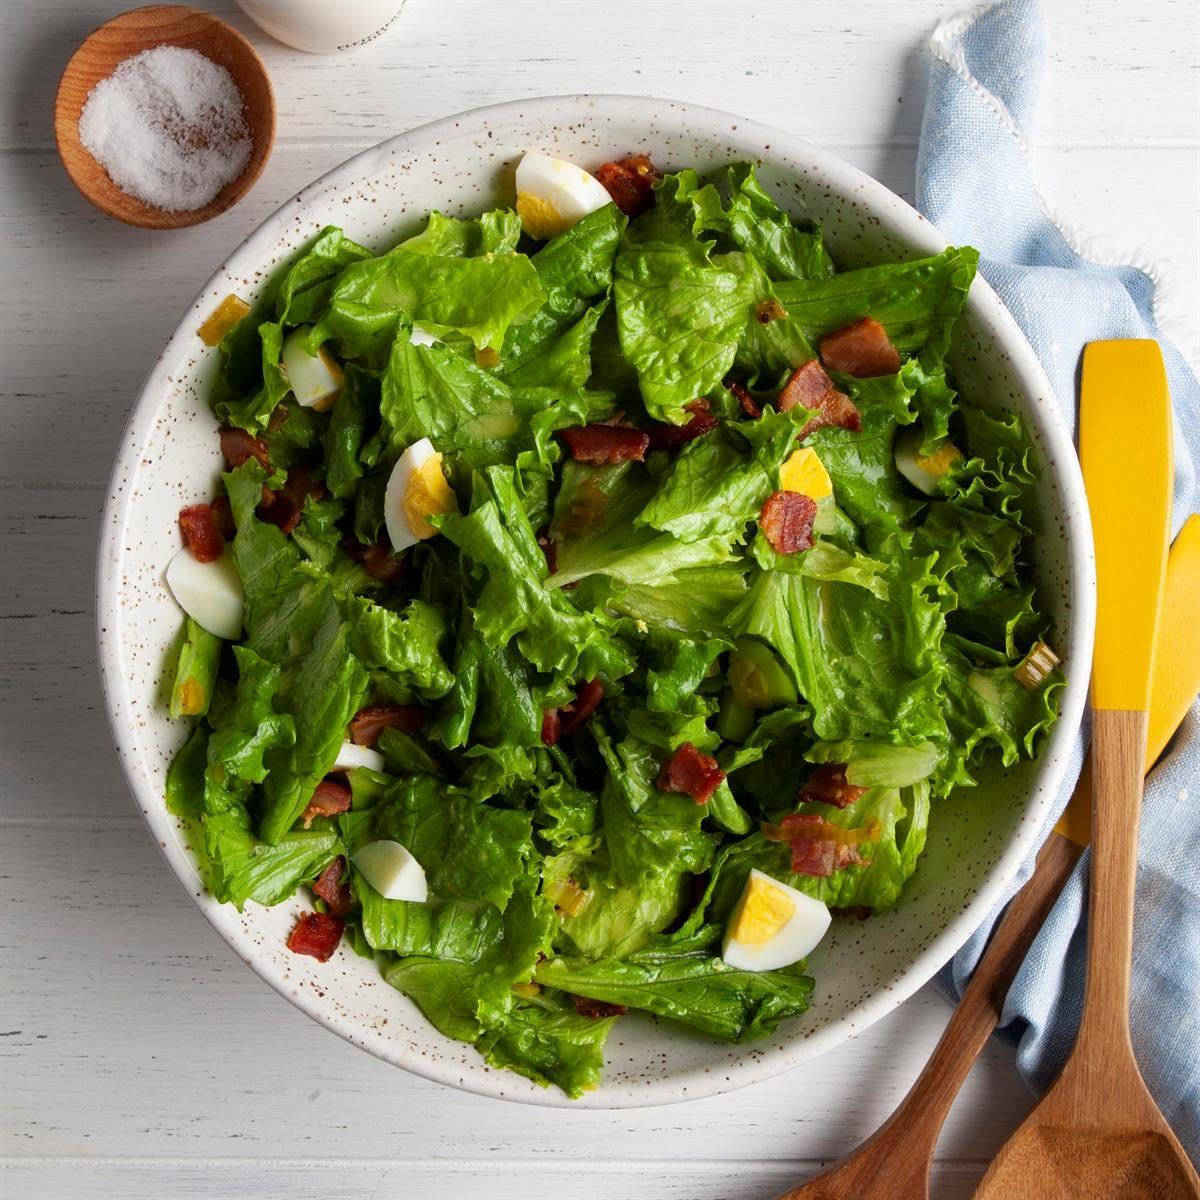 Iowa: Classic Wilted Lettuce Salad